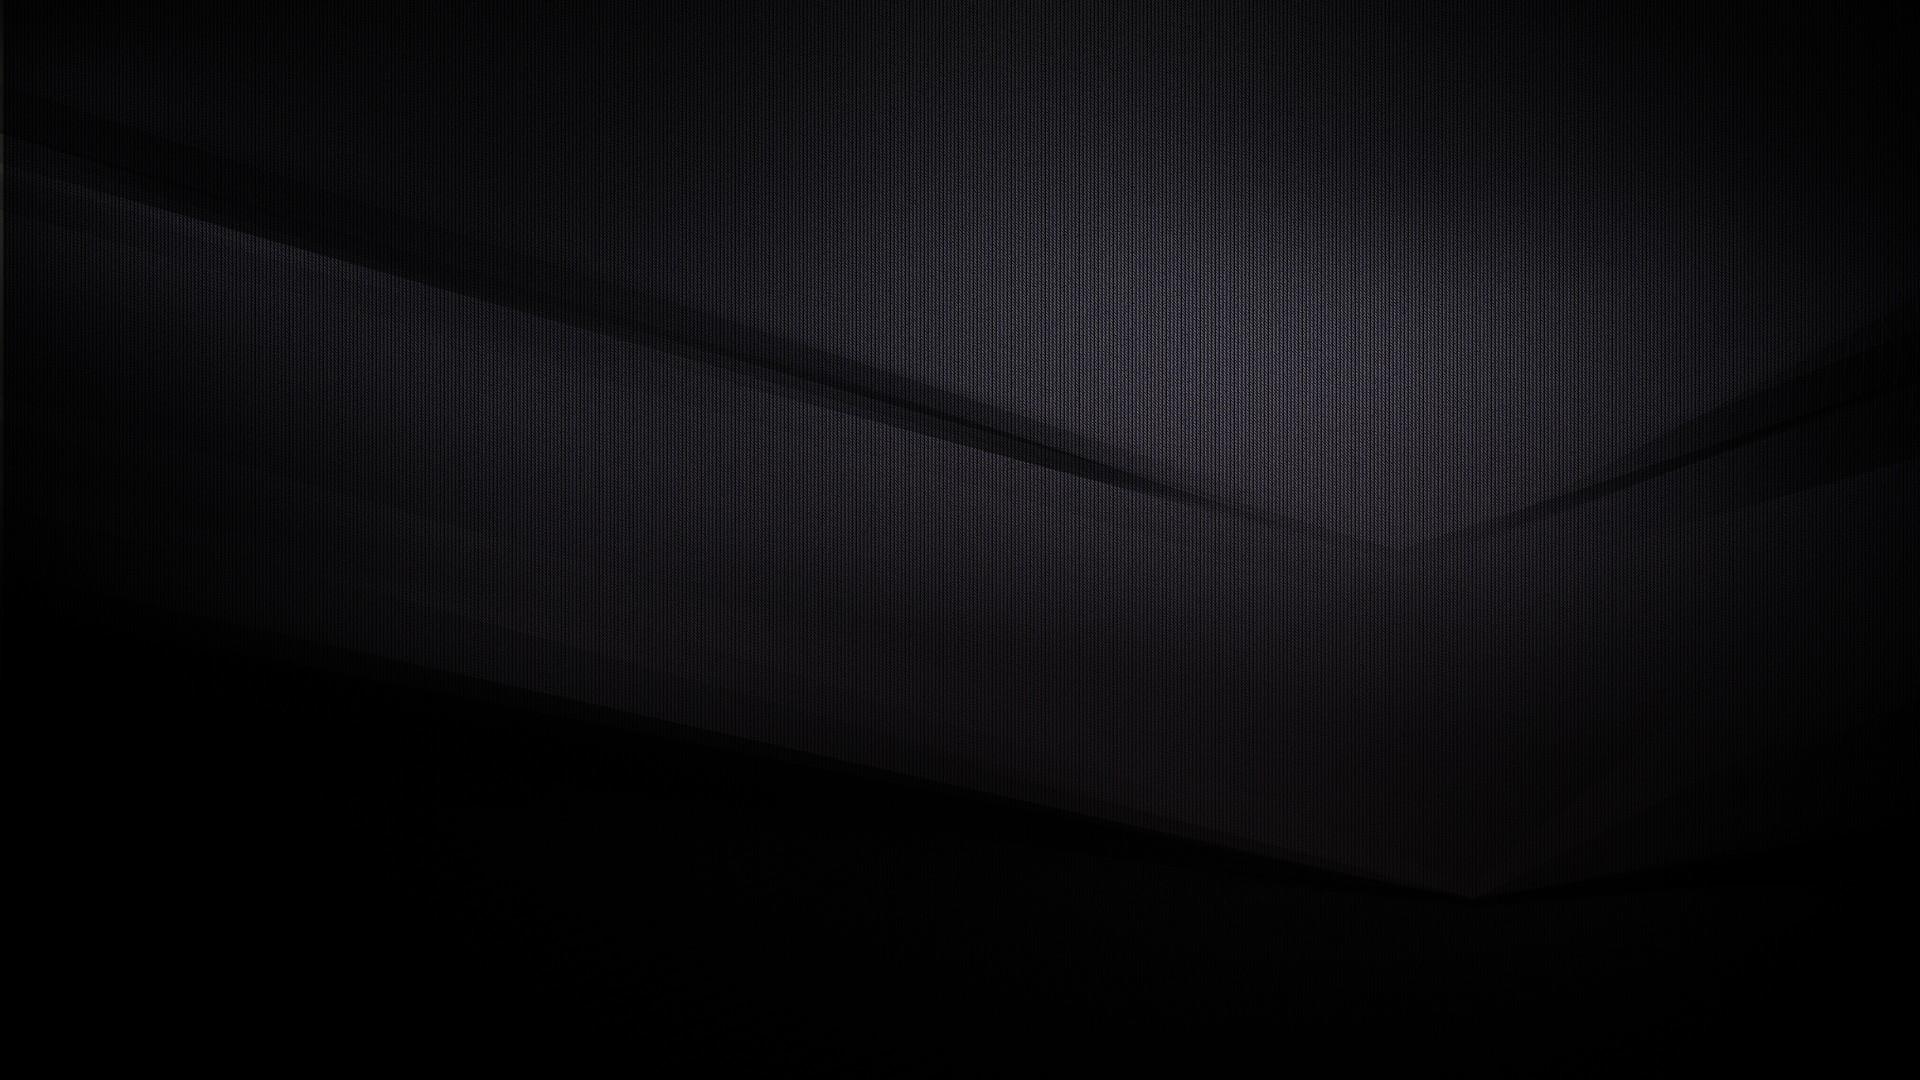 Black Hd Wallpaper 7 Desktop Background